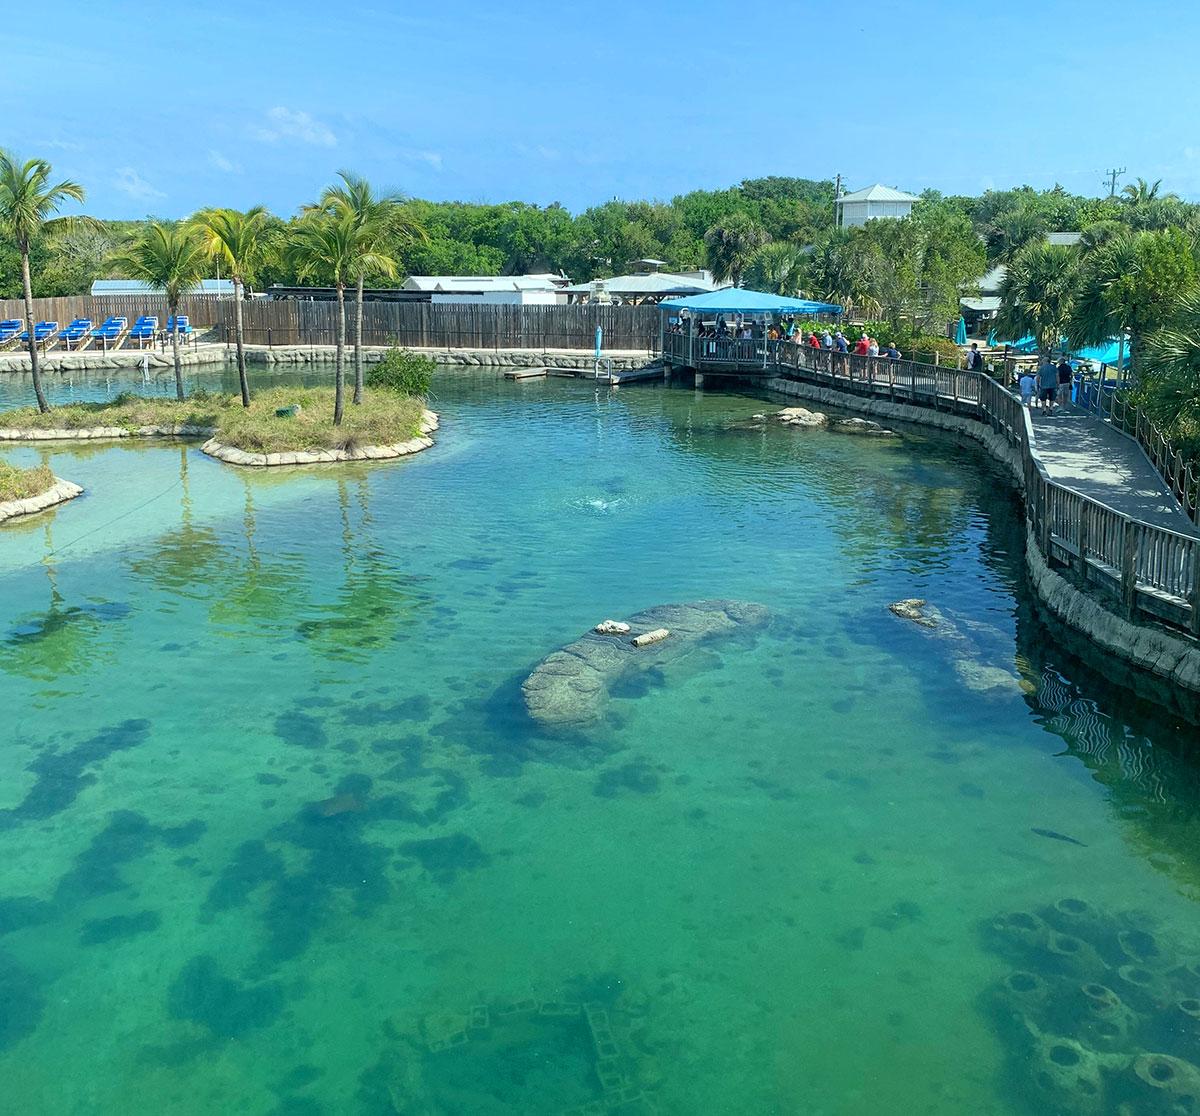 The Florida Oceanographic Coastal Center